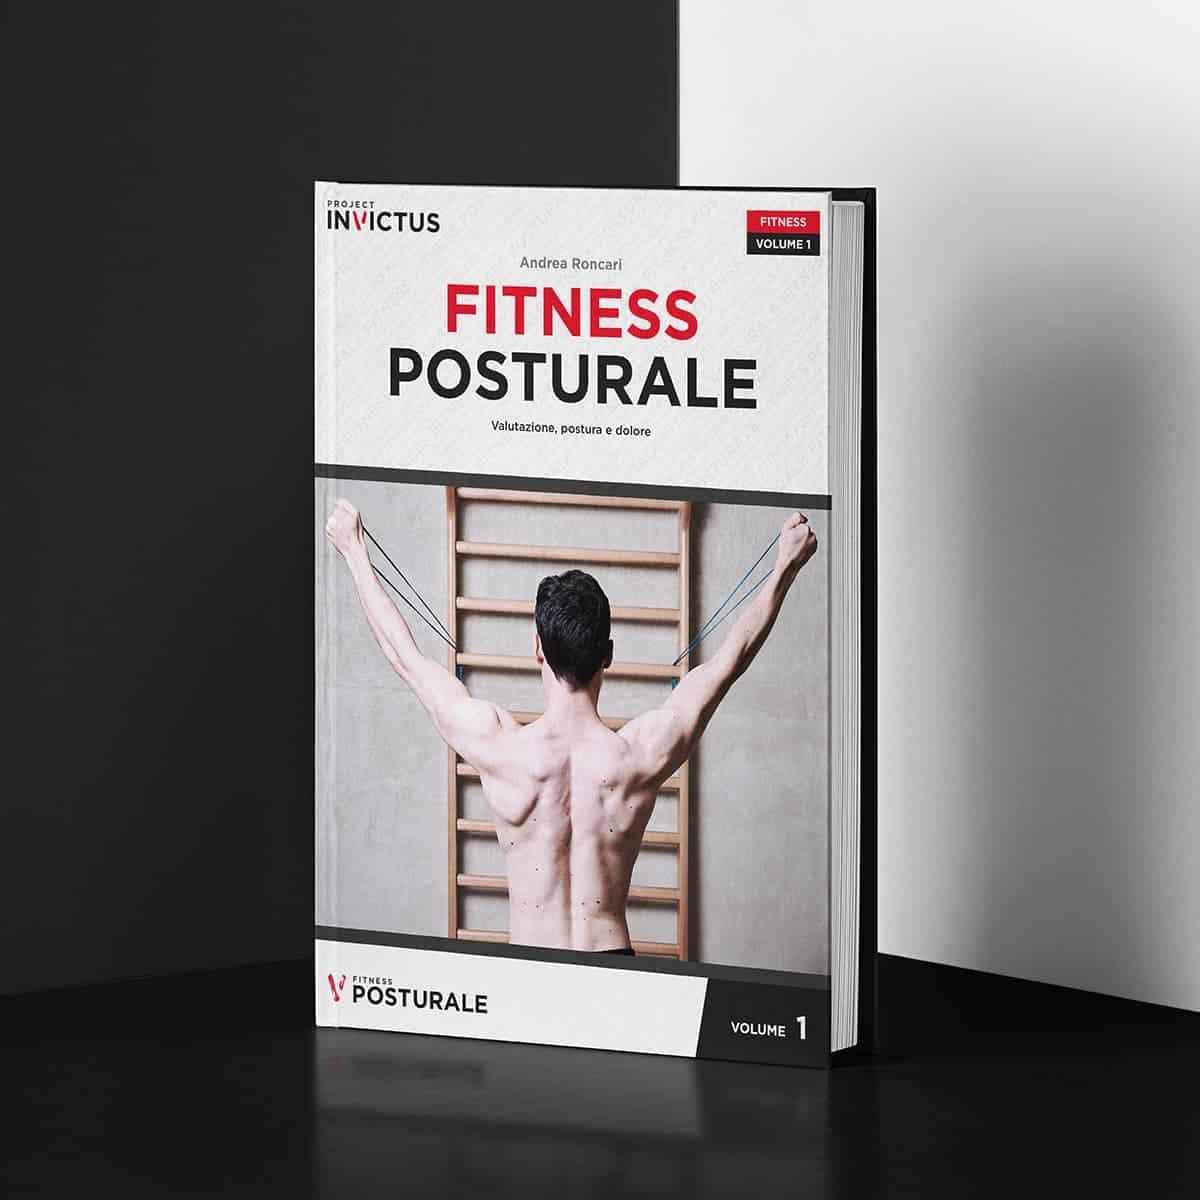 Fitness Posturale vol 1